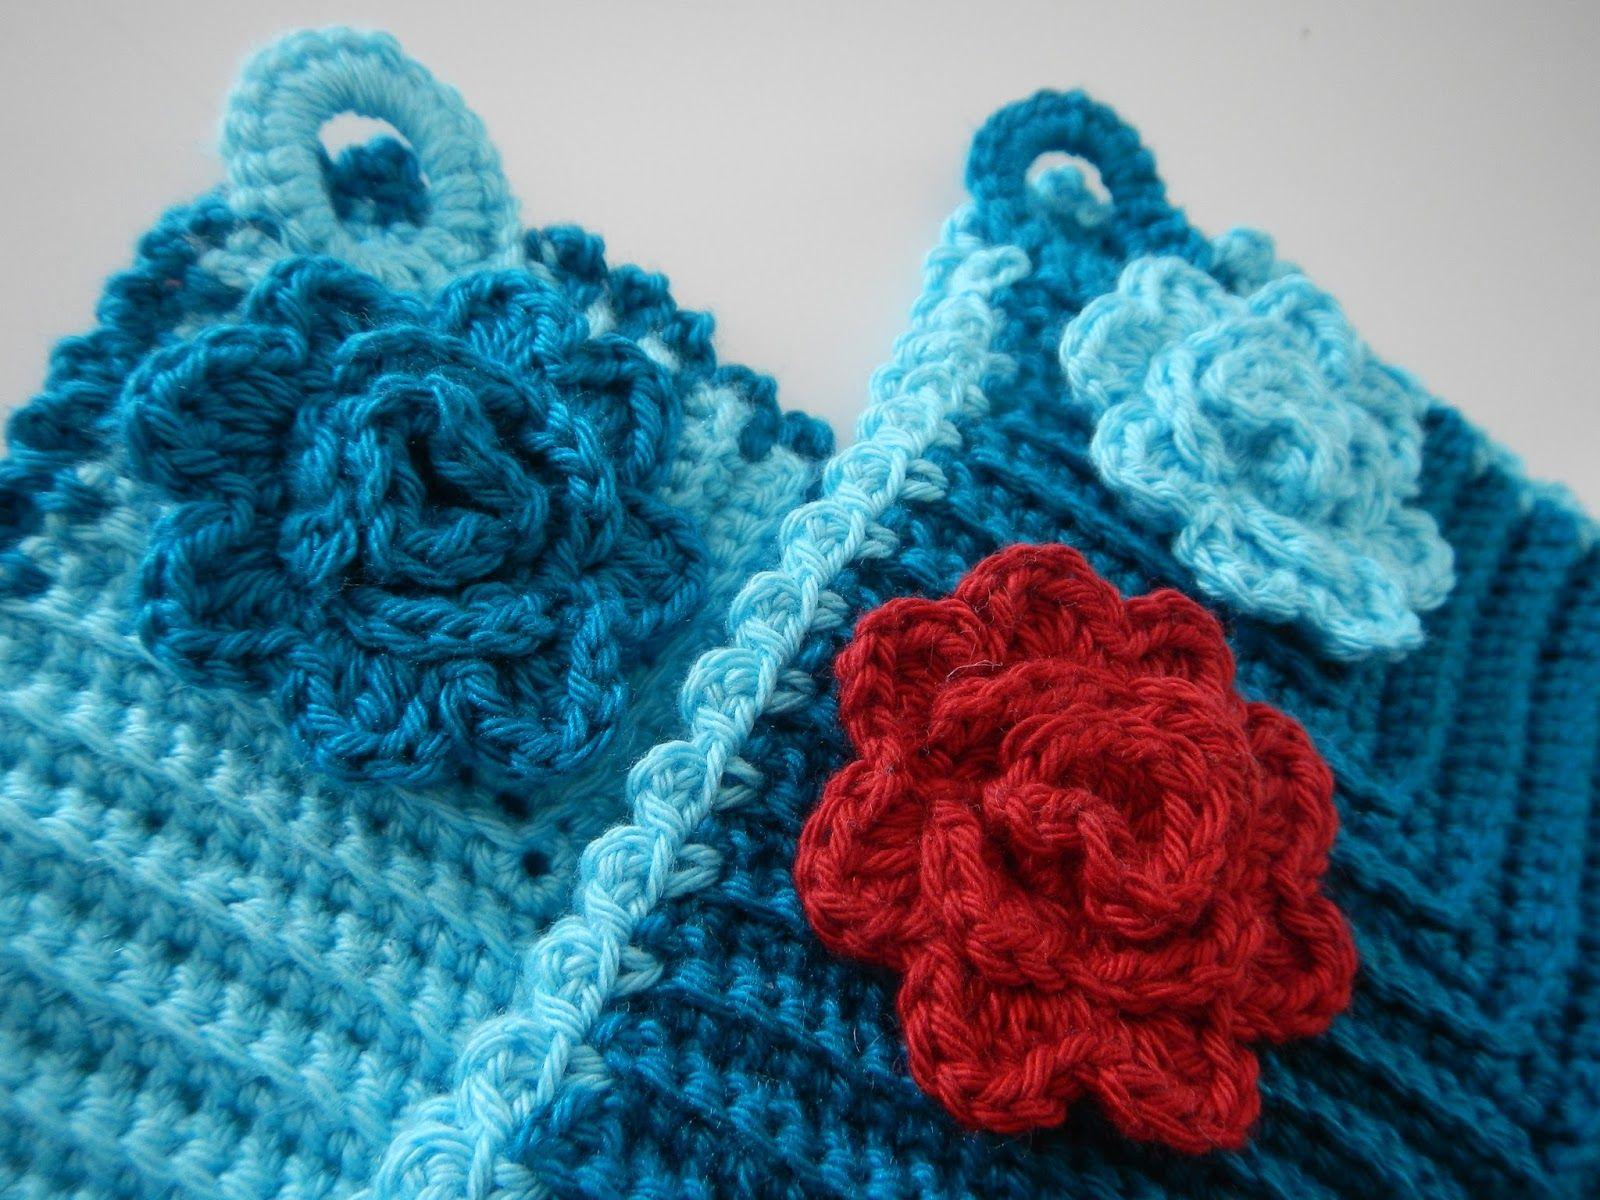 mitered dishcloth crochet pattern free   Apple Blossom Dreams: When ...